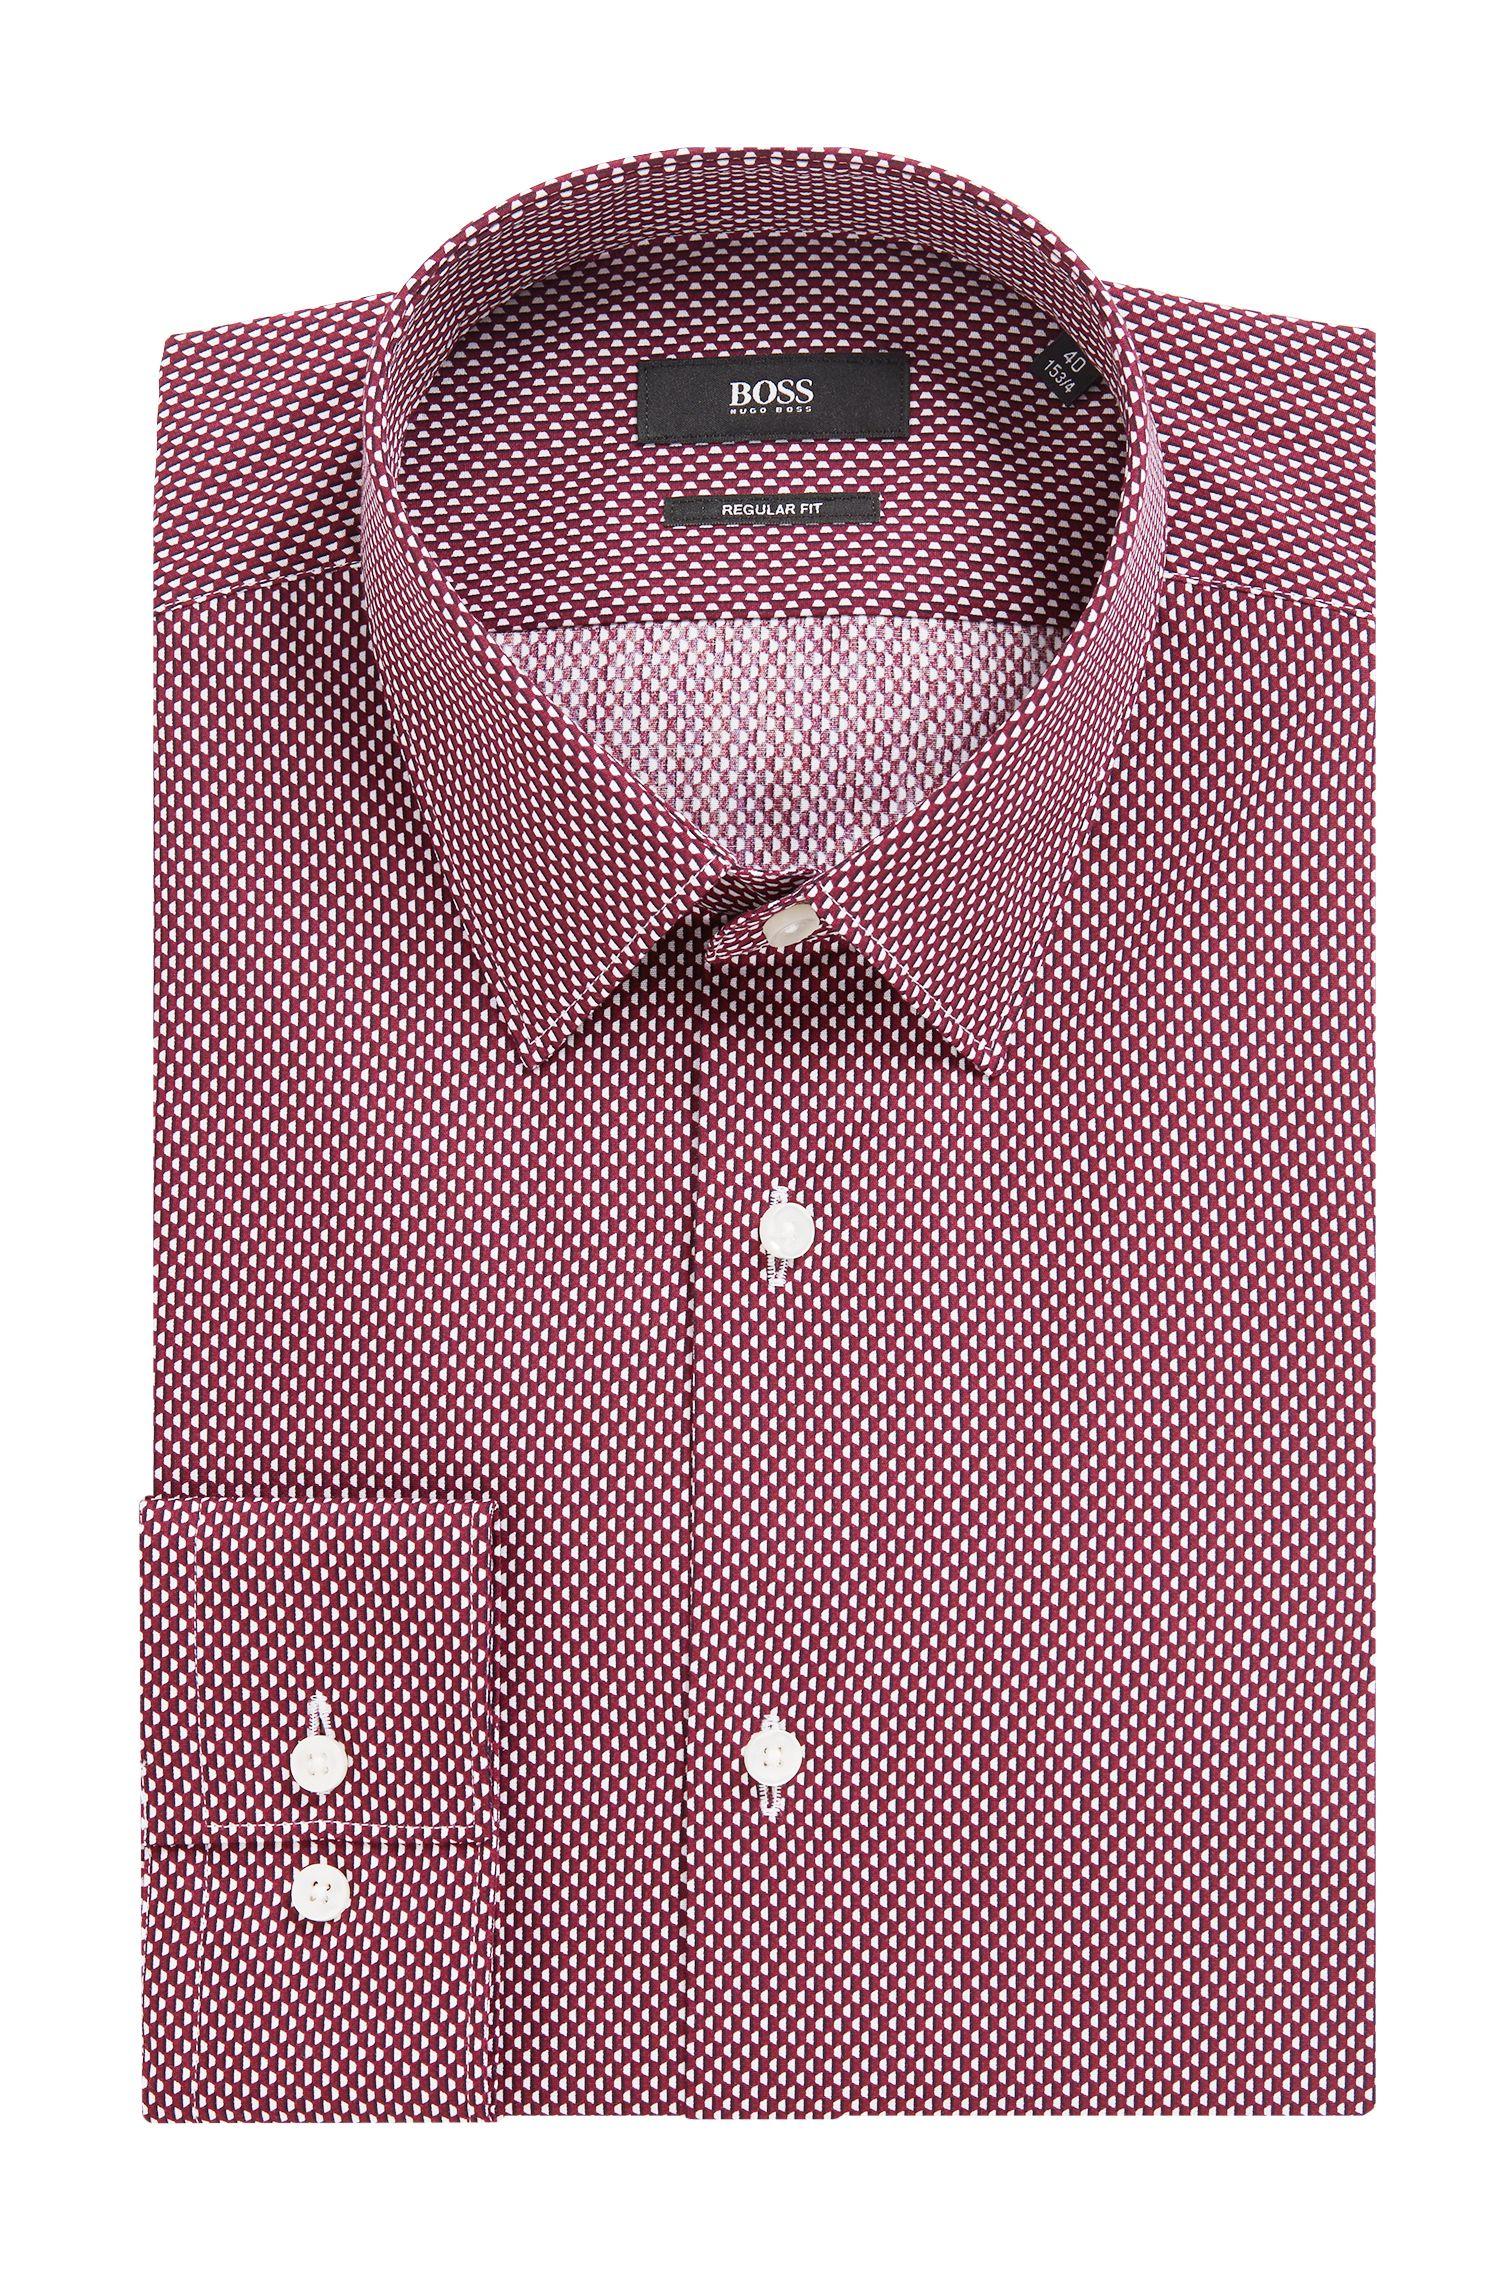 Regular-fit shirt in Italian cotton with hexagonal print, Dark Red